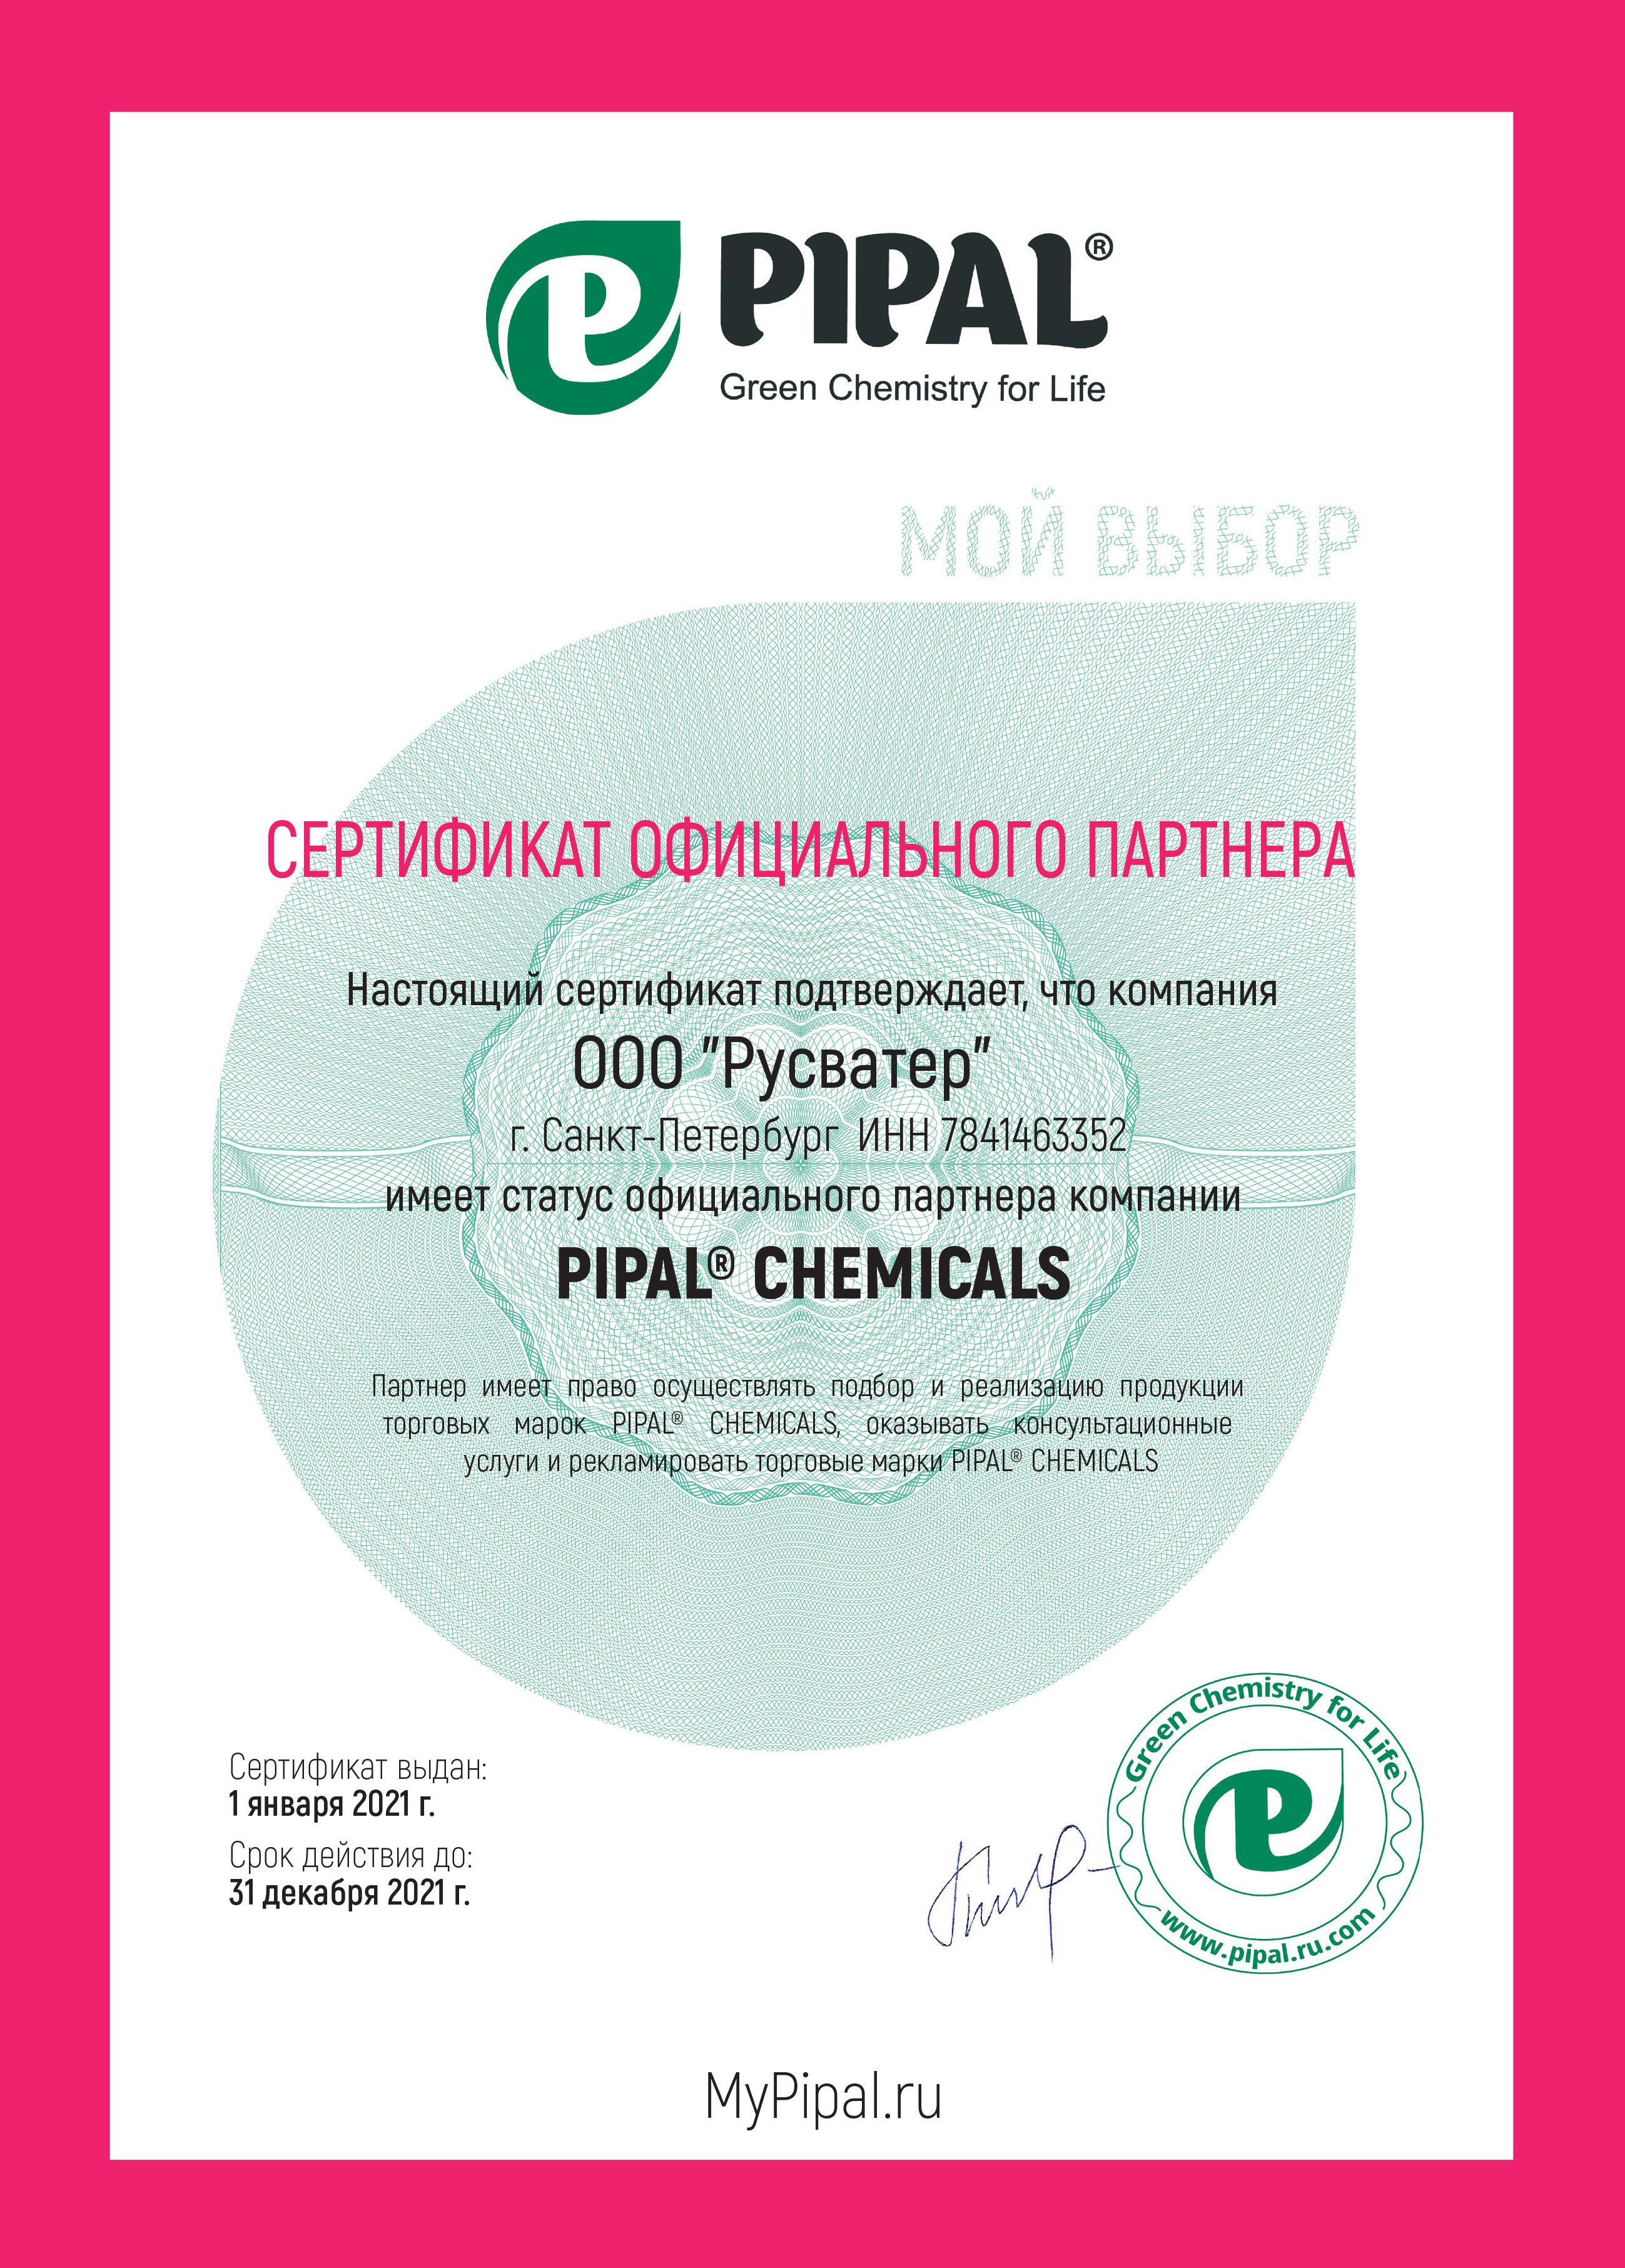 Сертификат партнерства с компанией Pipal Chemicals